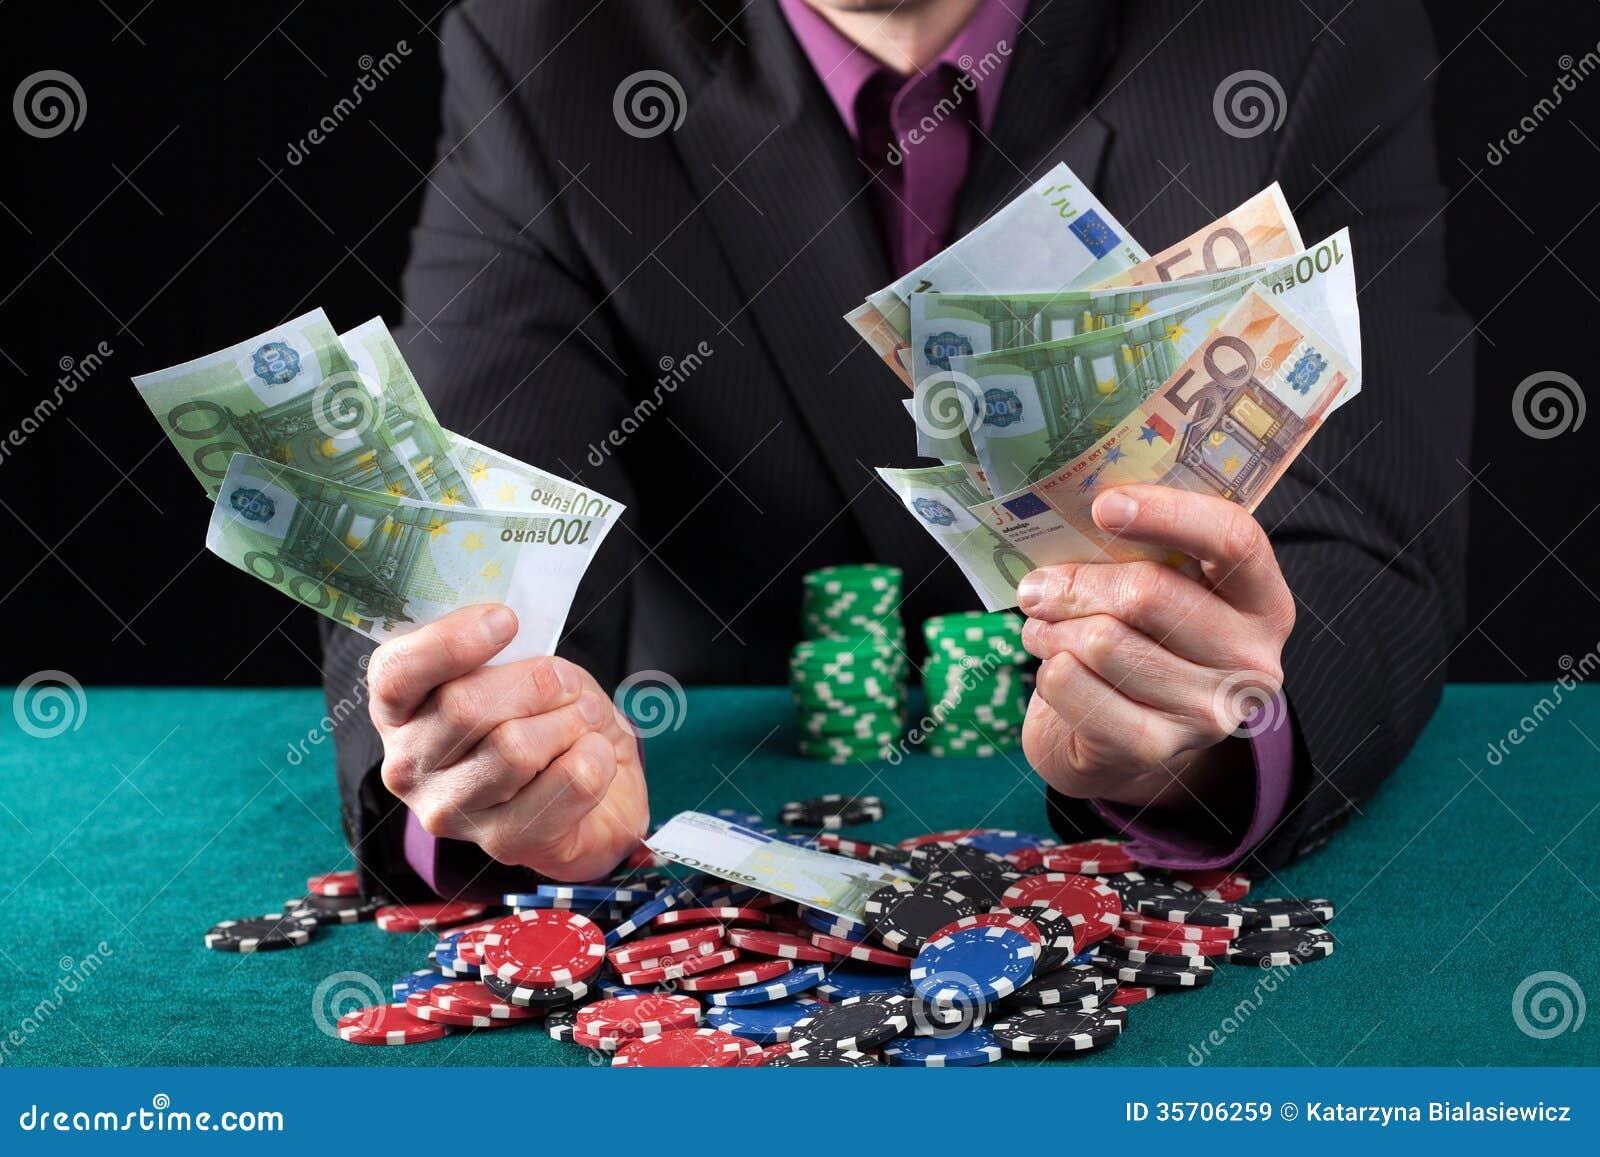 Cash in -341031